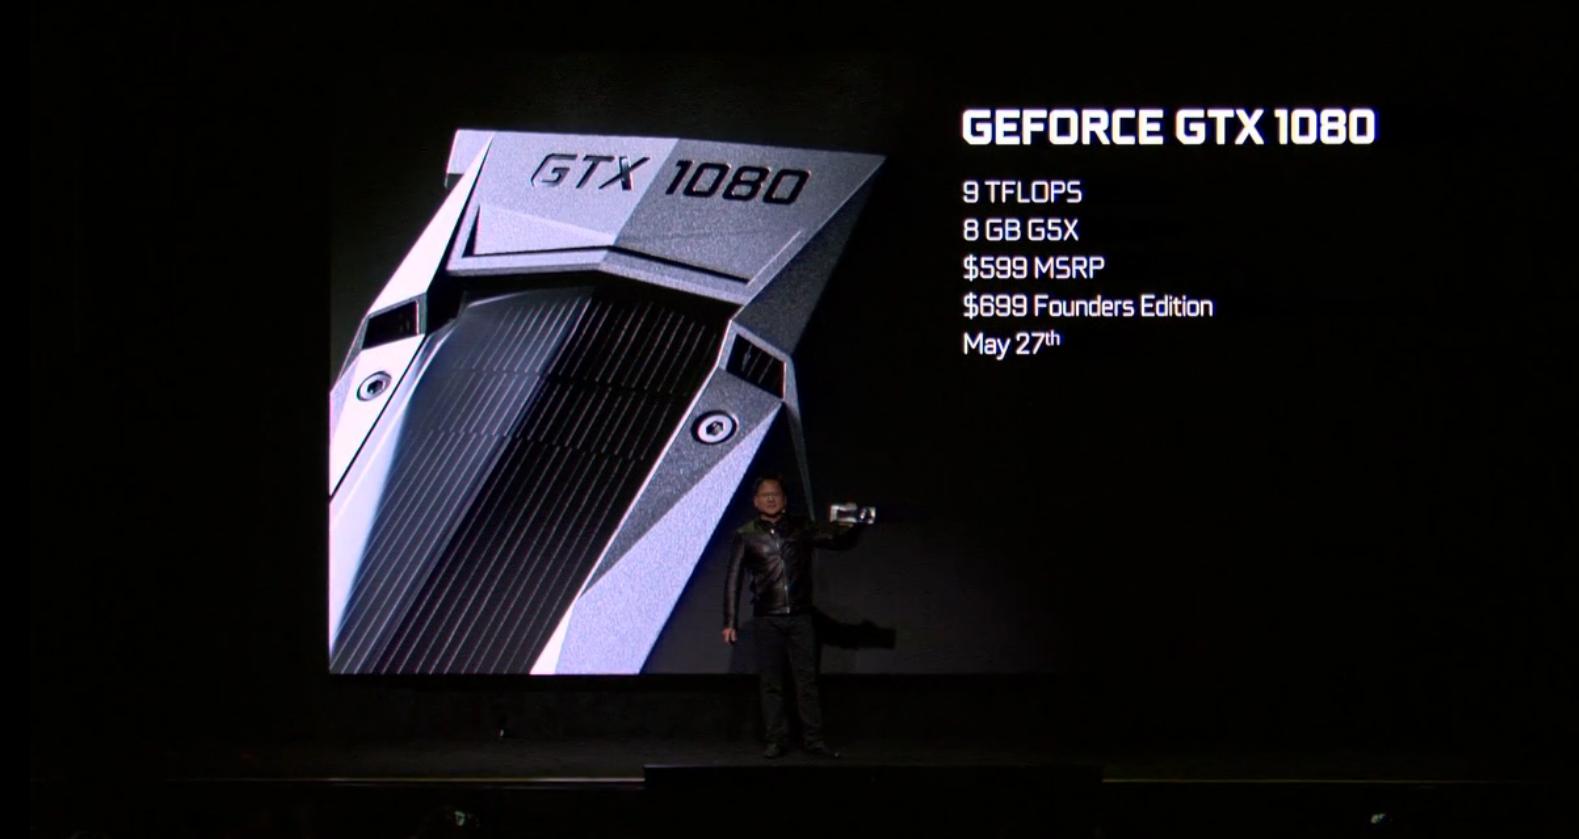 NVIDIA GeForce GTX 1080 and GTX 1070 Announced